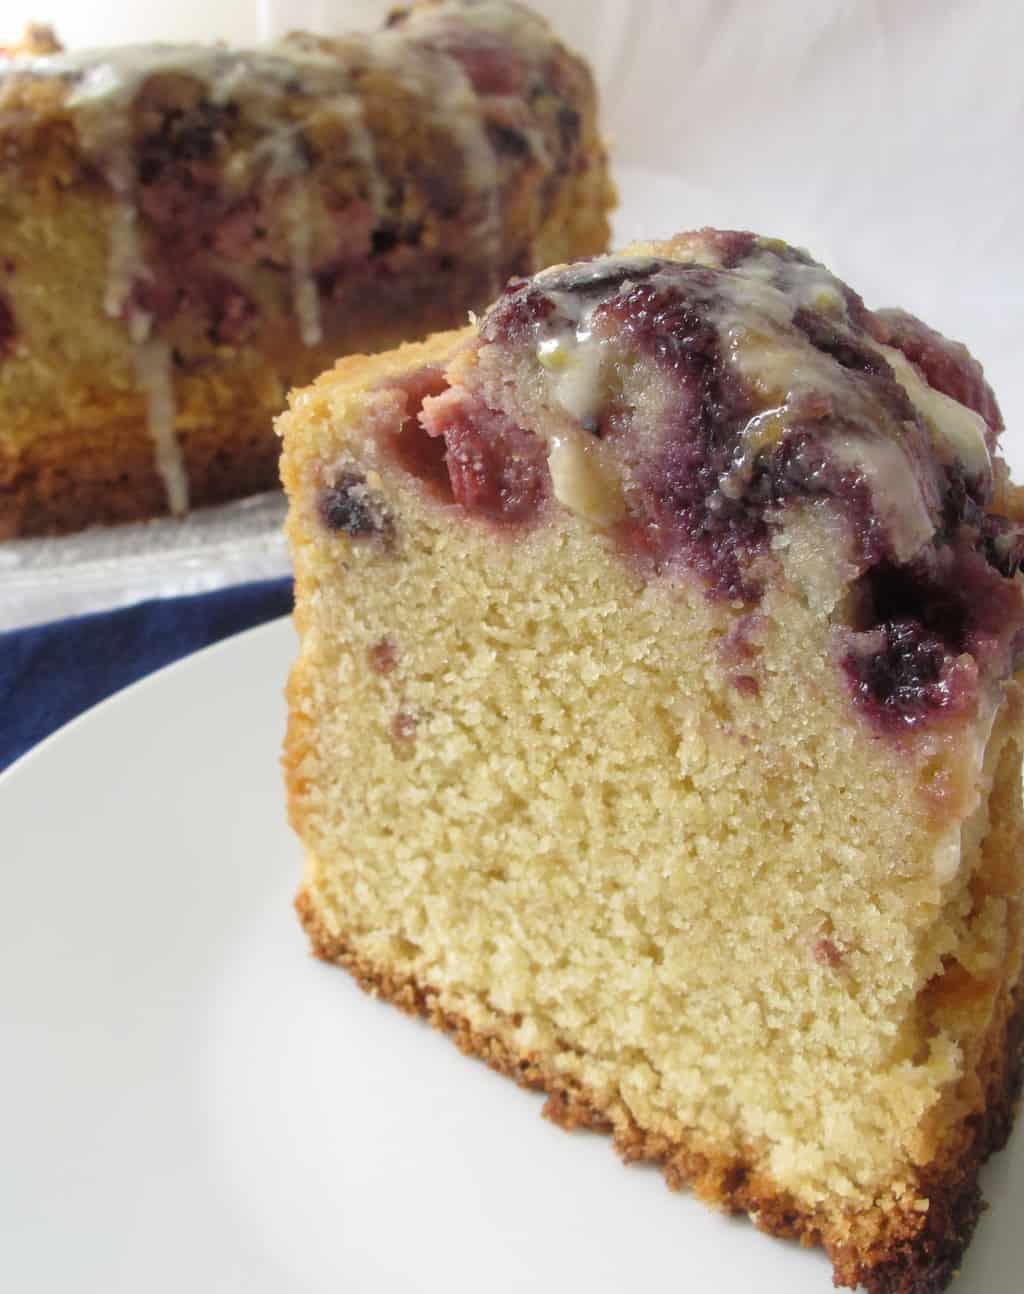 Gluten-Free Berry Delicious Bundt Cake